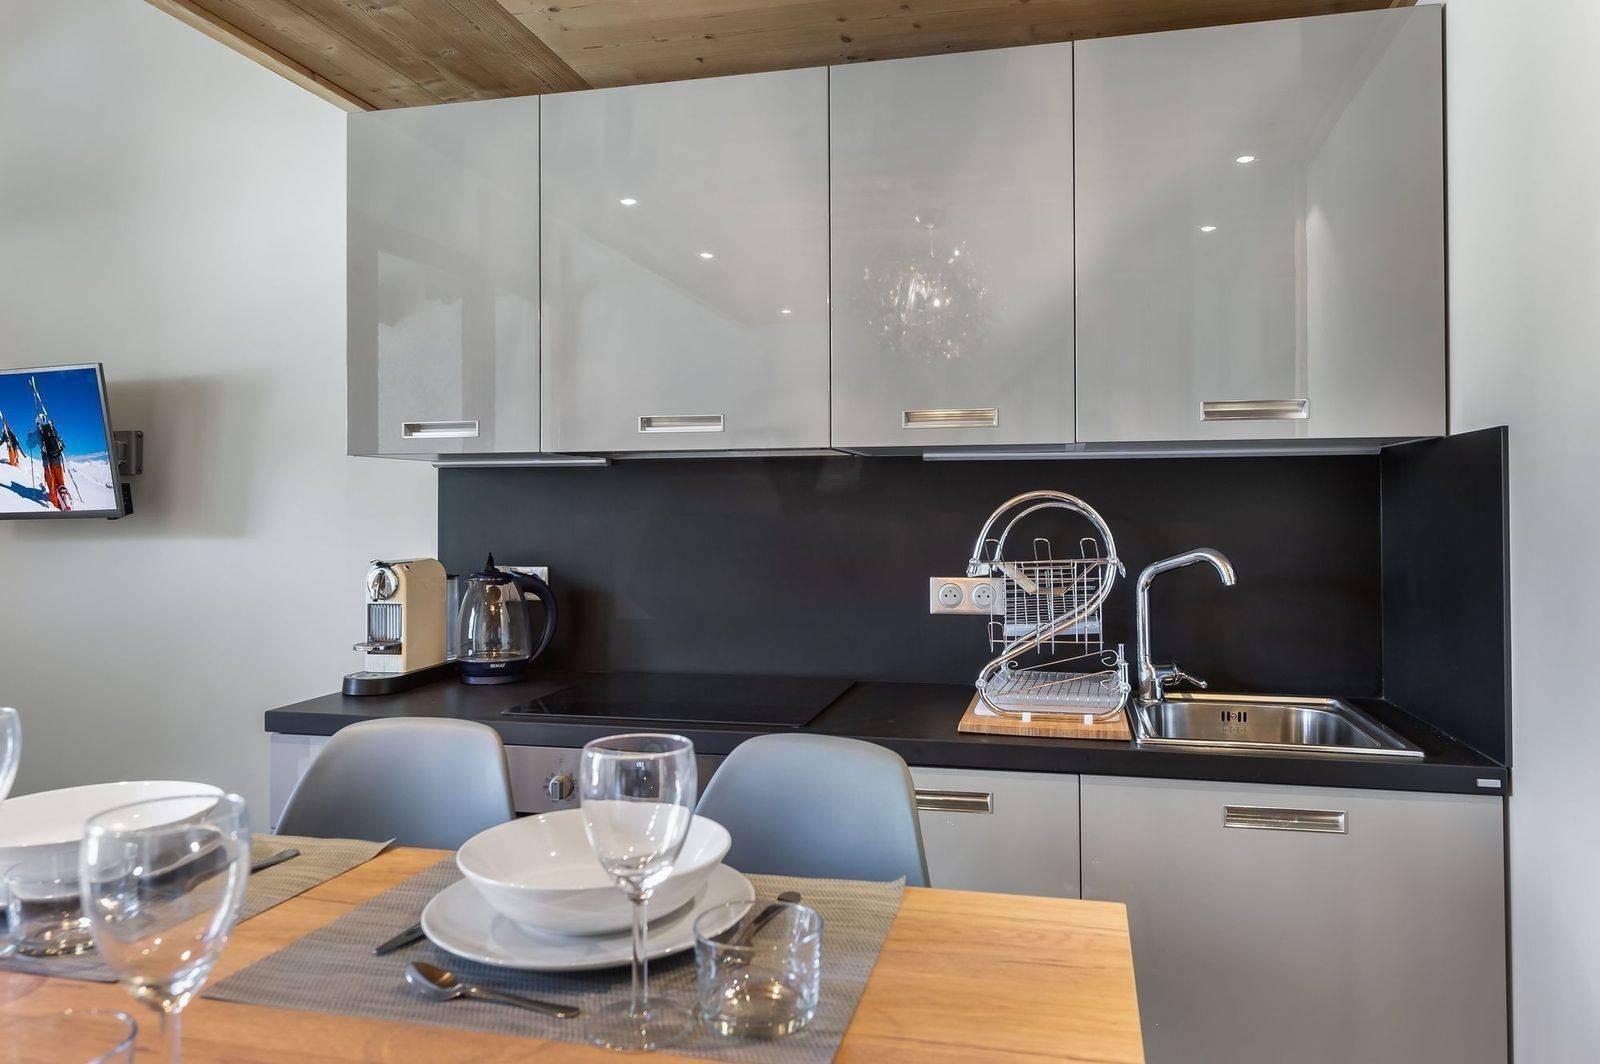 Val d'Isère Luxury Rental Appartment Virlouve Kitchen 2